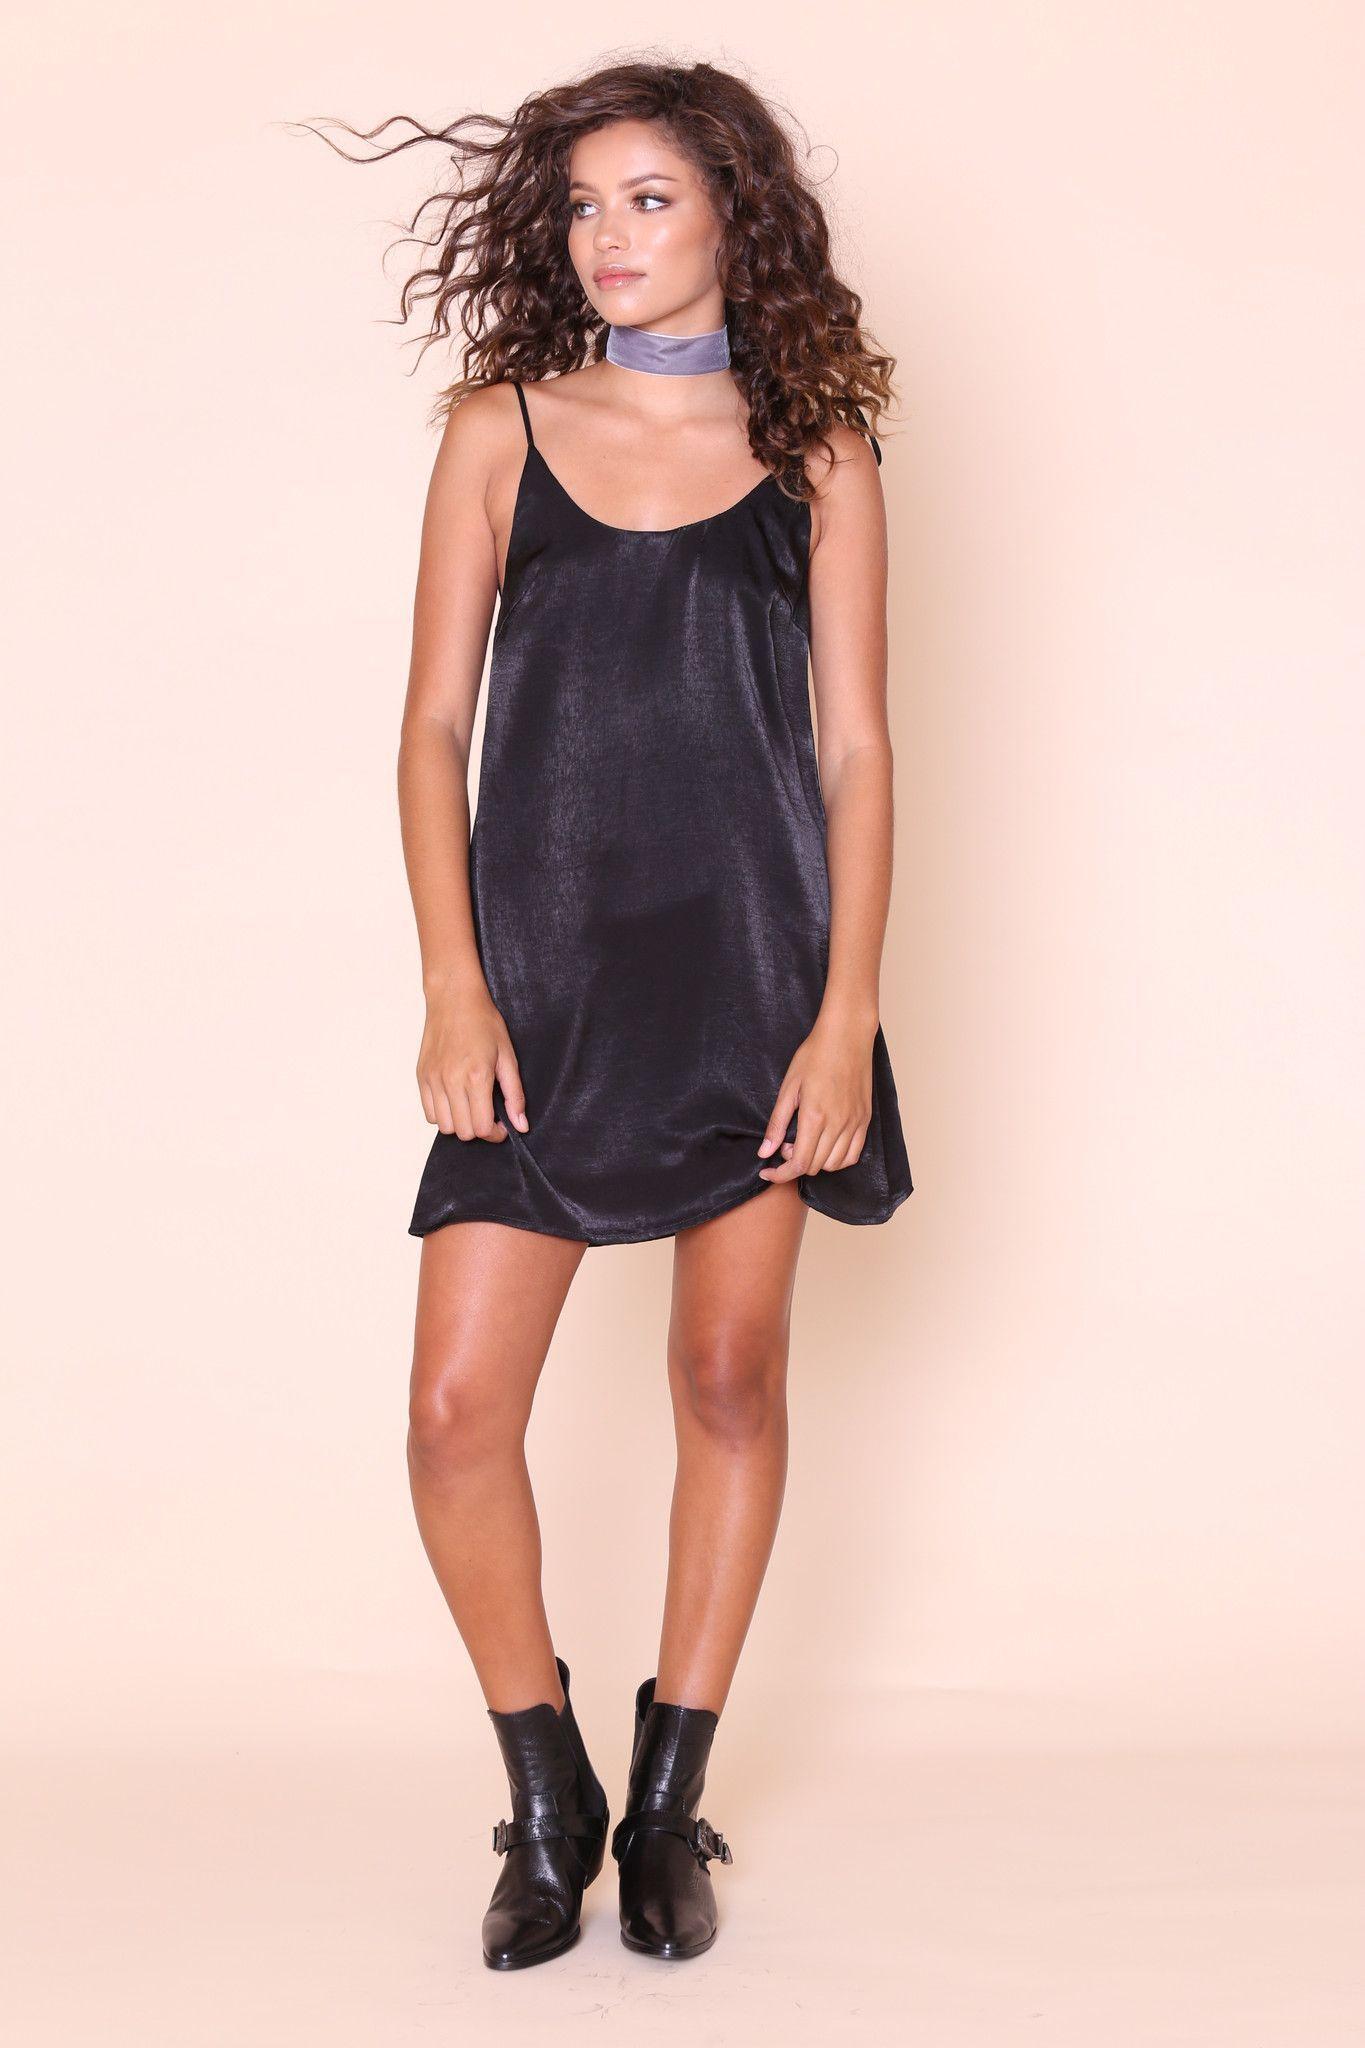 Silky cami slip dress adjustable tie straps with metal tips open